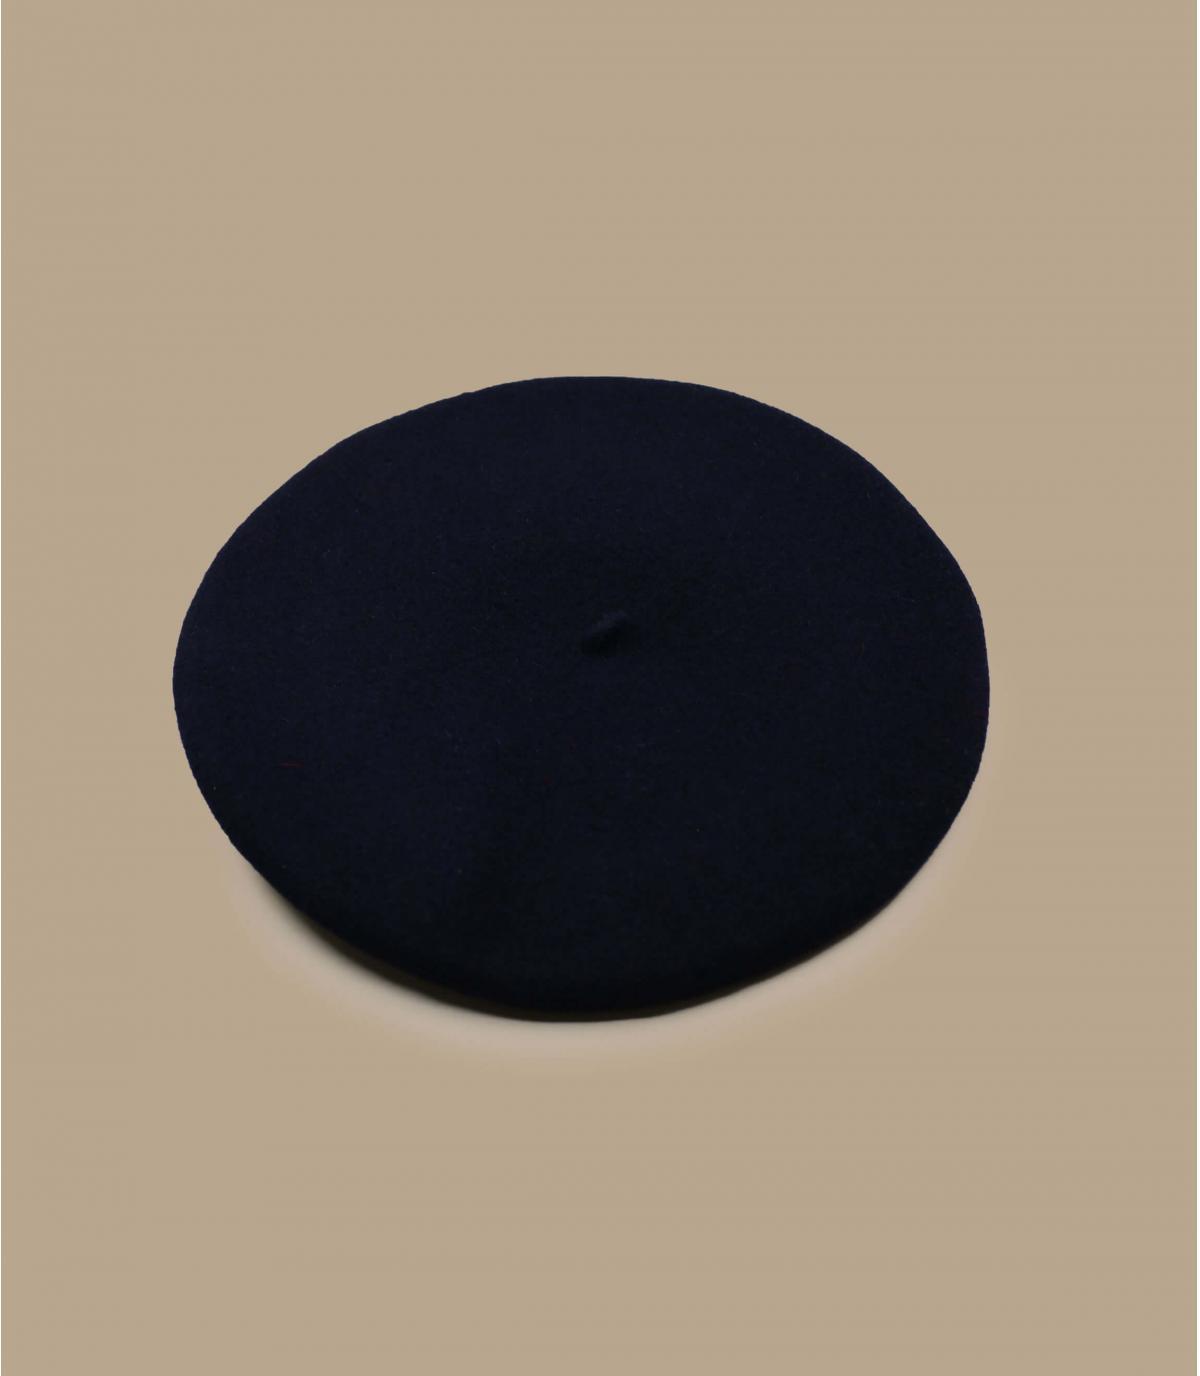 b ret bleu femme achat vente de b rets femme bleu headict. Black Bedroom Furniture Sets. Home Design Ideas